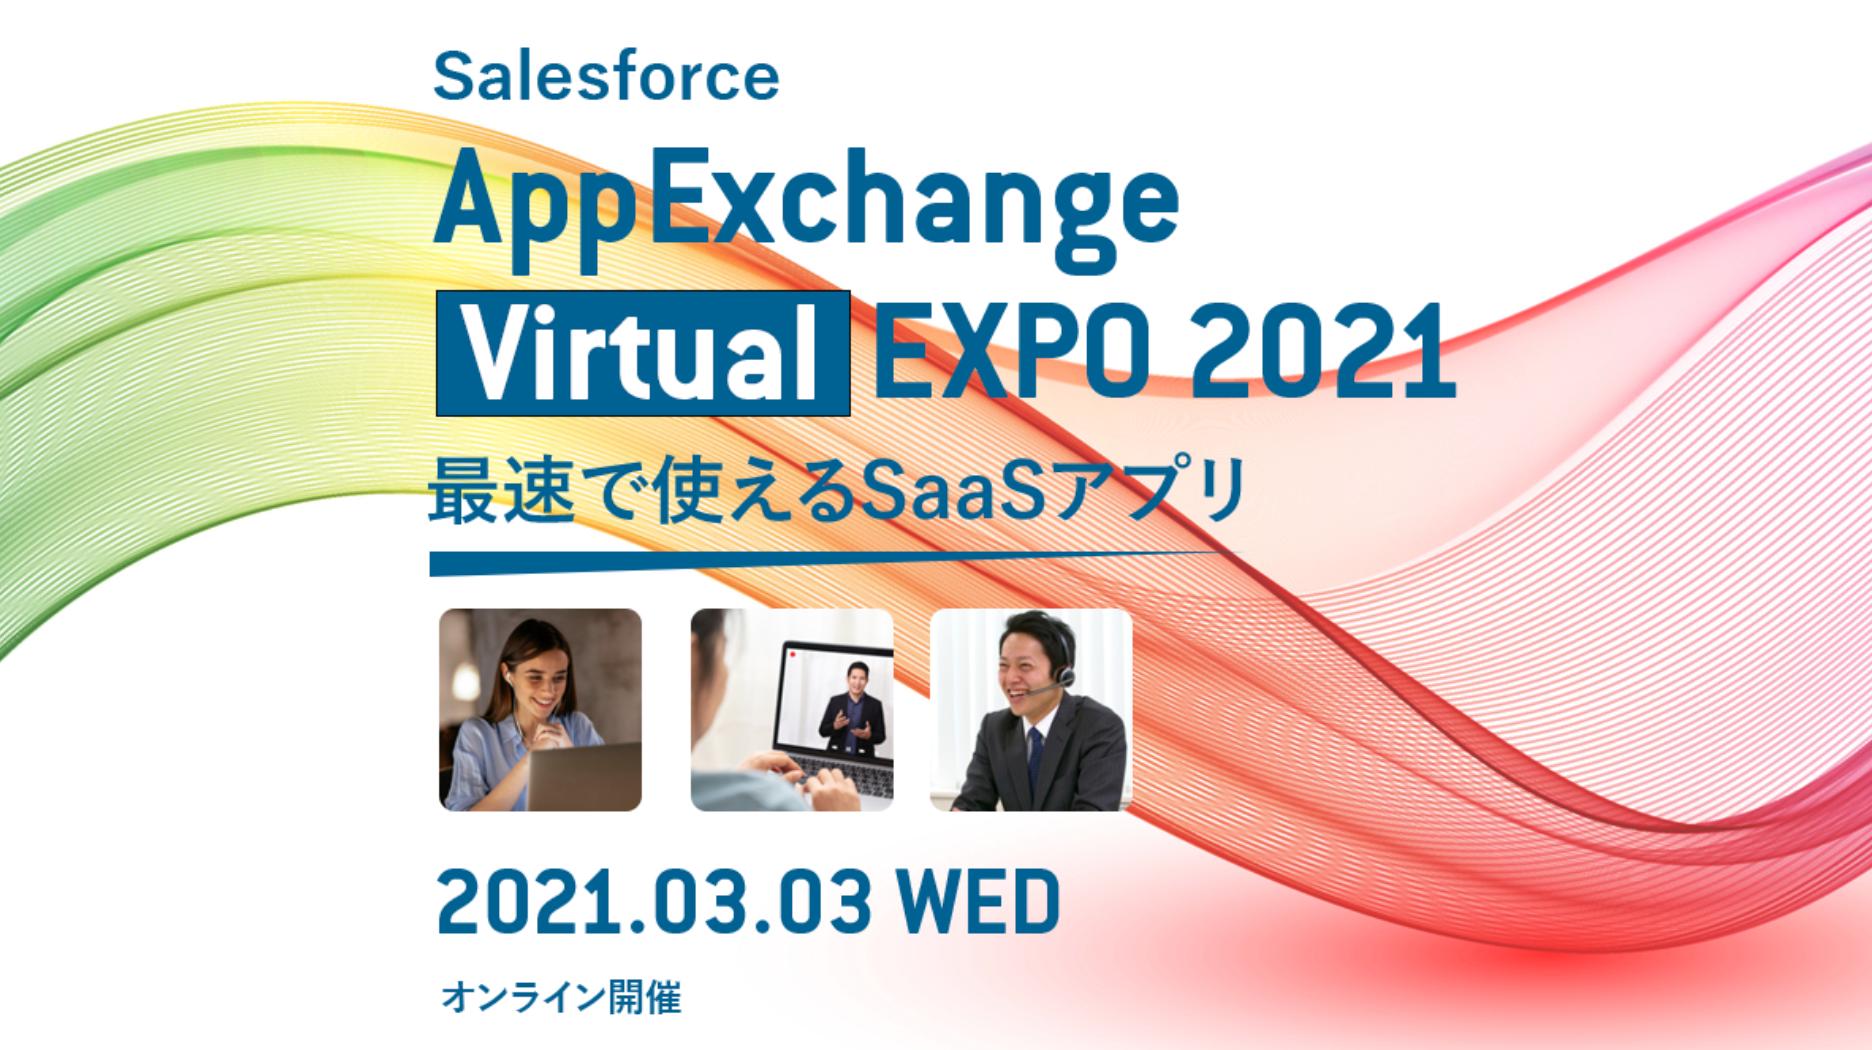 AppExchange Virtual EXPO  2021に出展いたします。